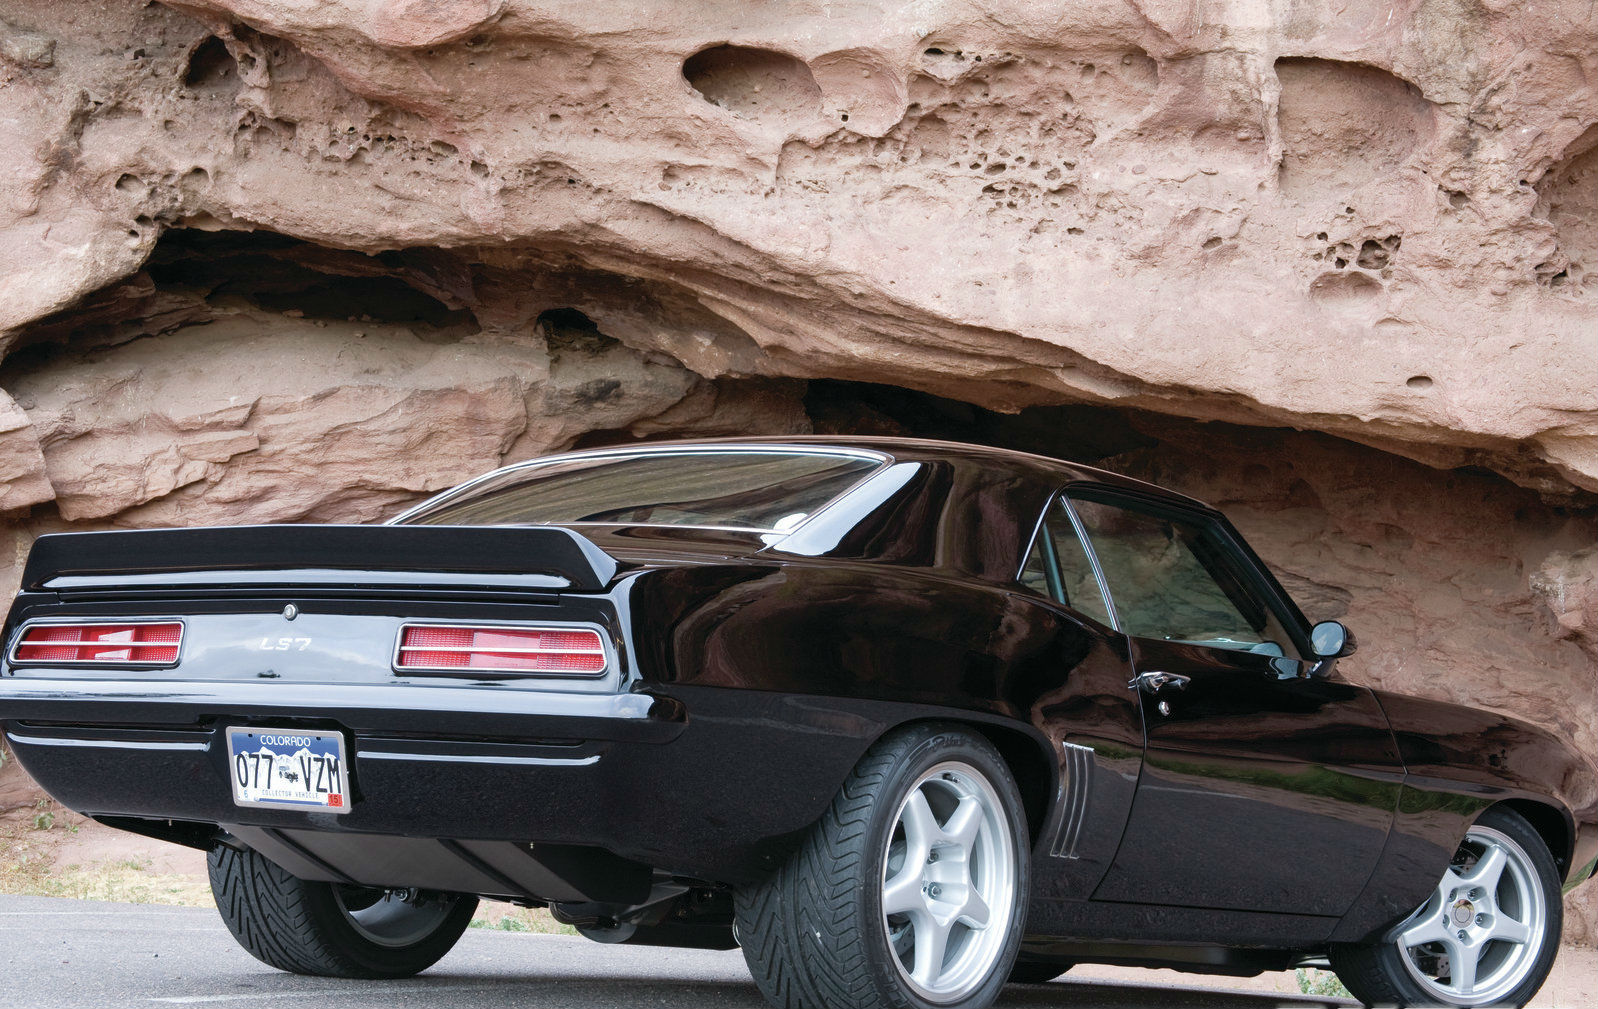 sucp_1211_10_1969_chevy_camaro_road_rage_